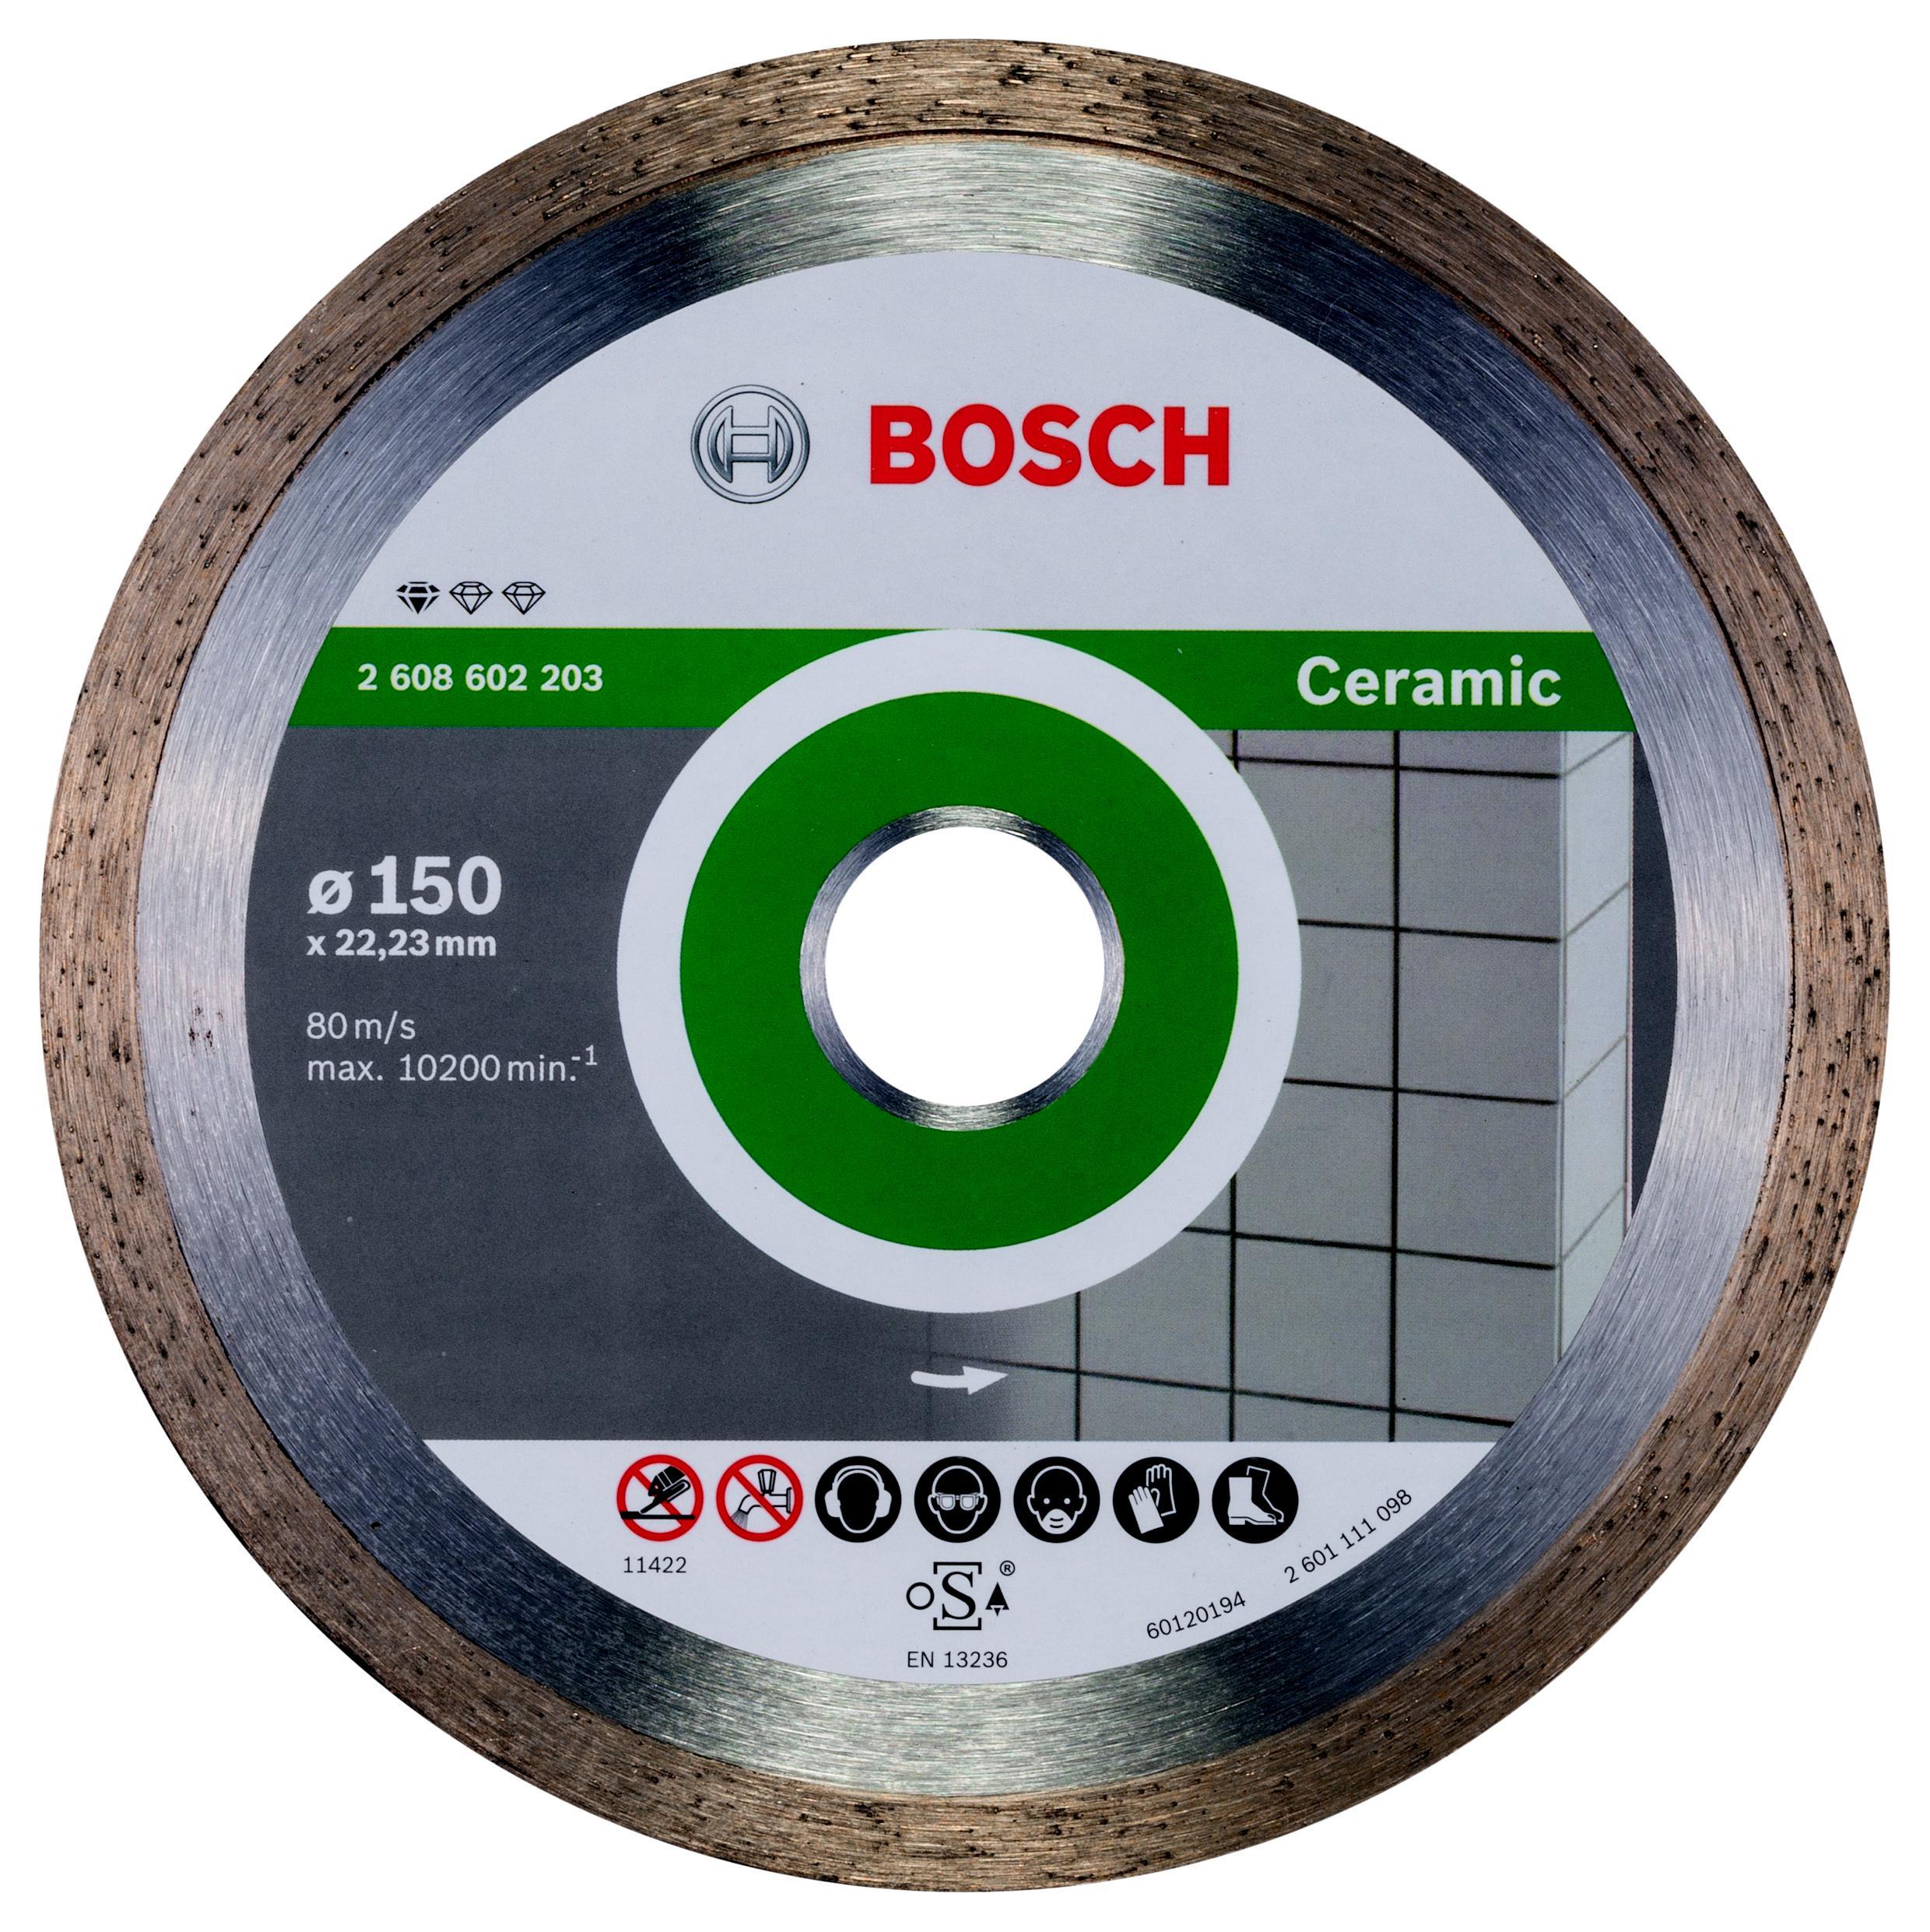 Круг алмазный Bosch Standard for ceramic 150x22 корона (сплошной)(2.608.602.203) алмазный диск bosch standard for ceramic 115 22 23 2608602201